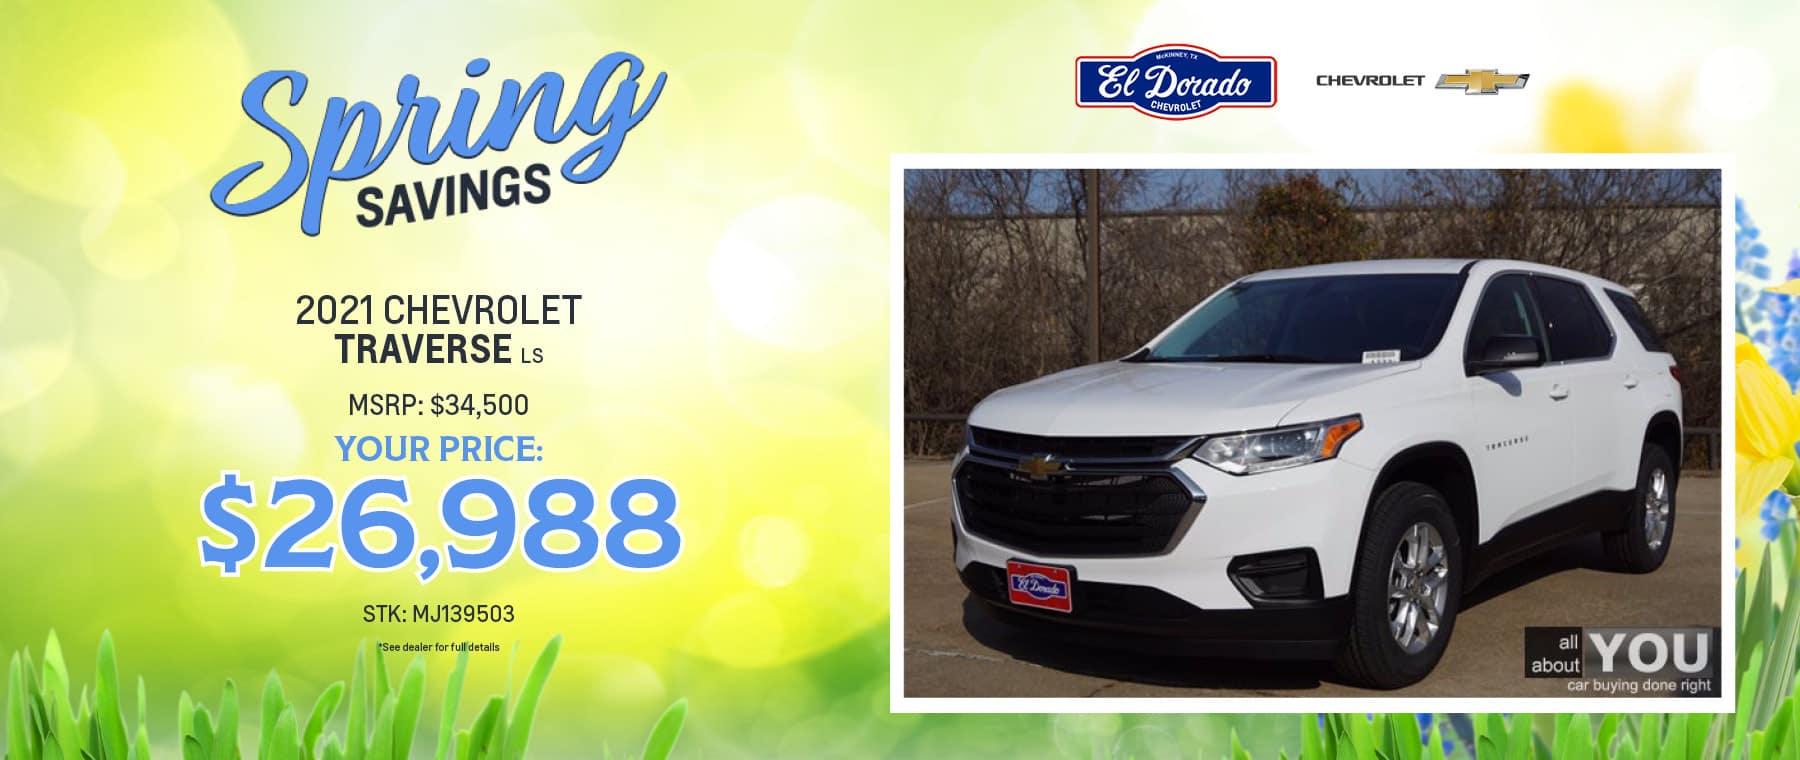 2021 Chevrolet Traverse LS Offer - El Dorado Chevrolet in McKinney, Texas